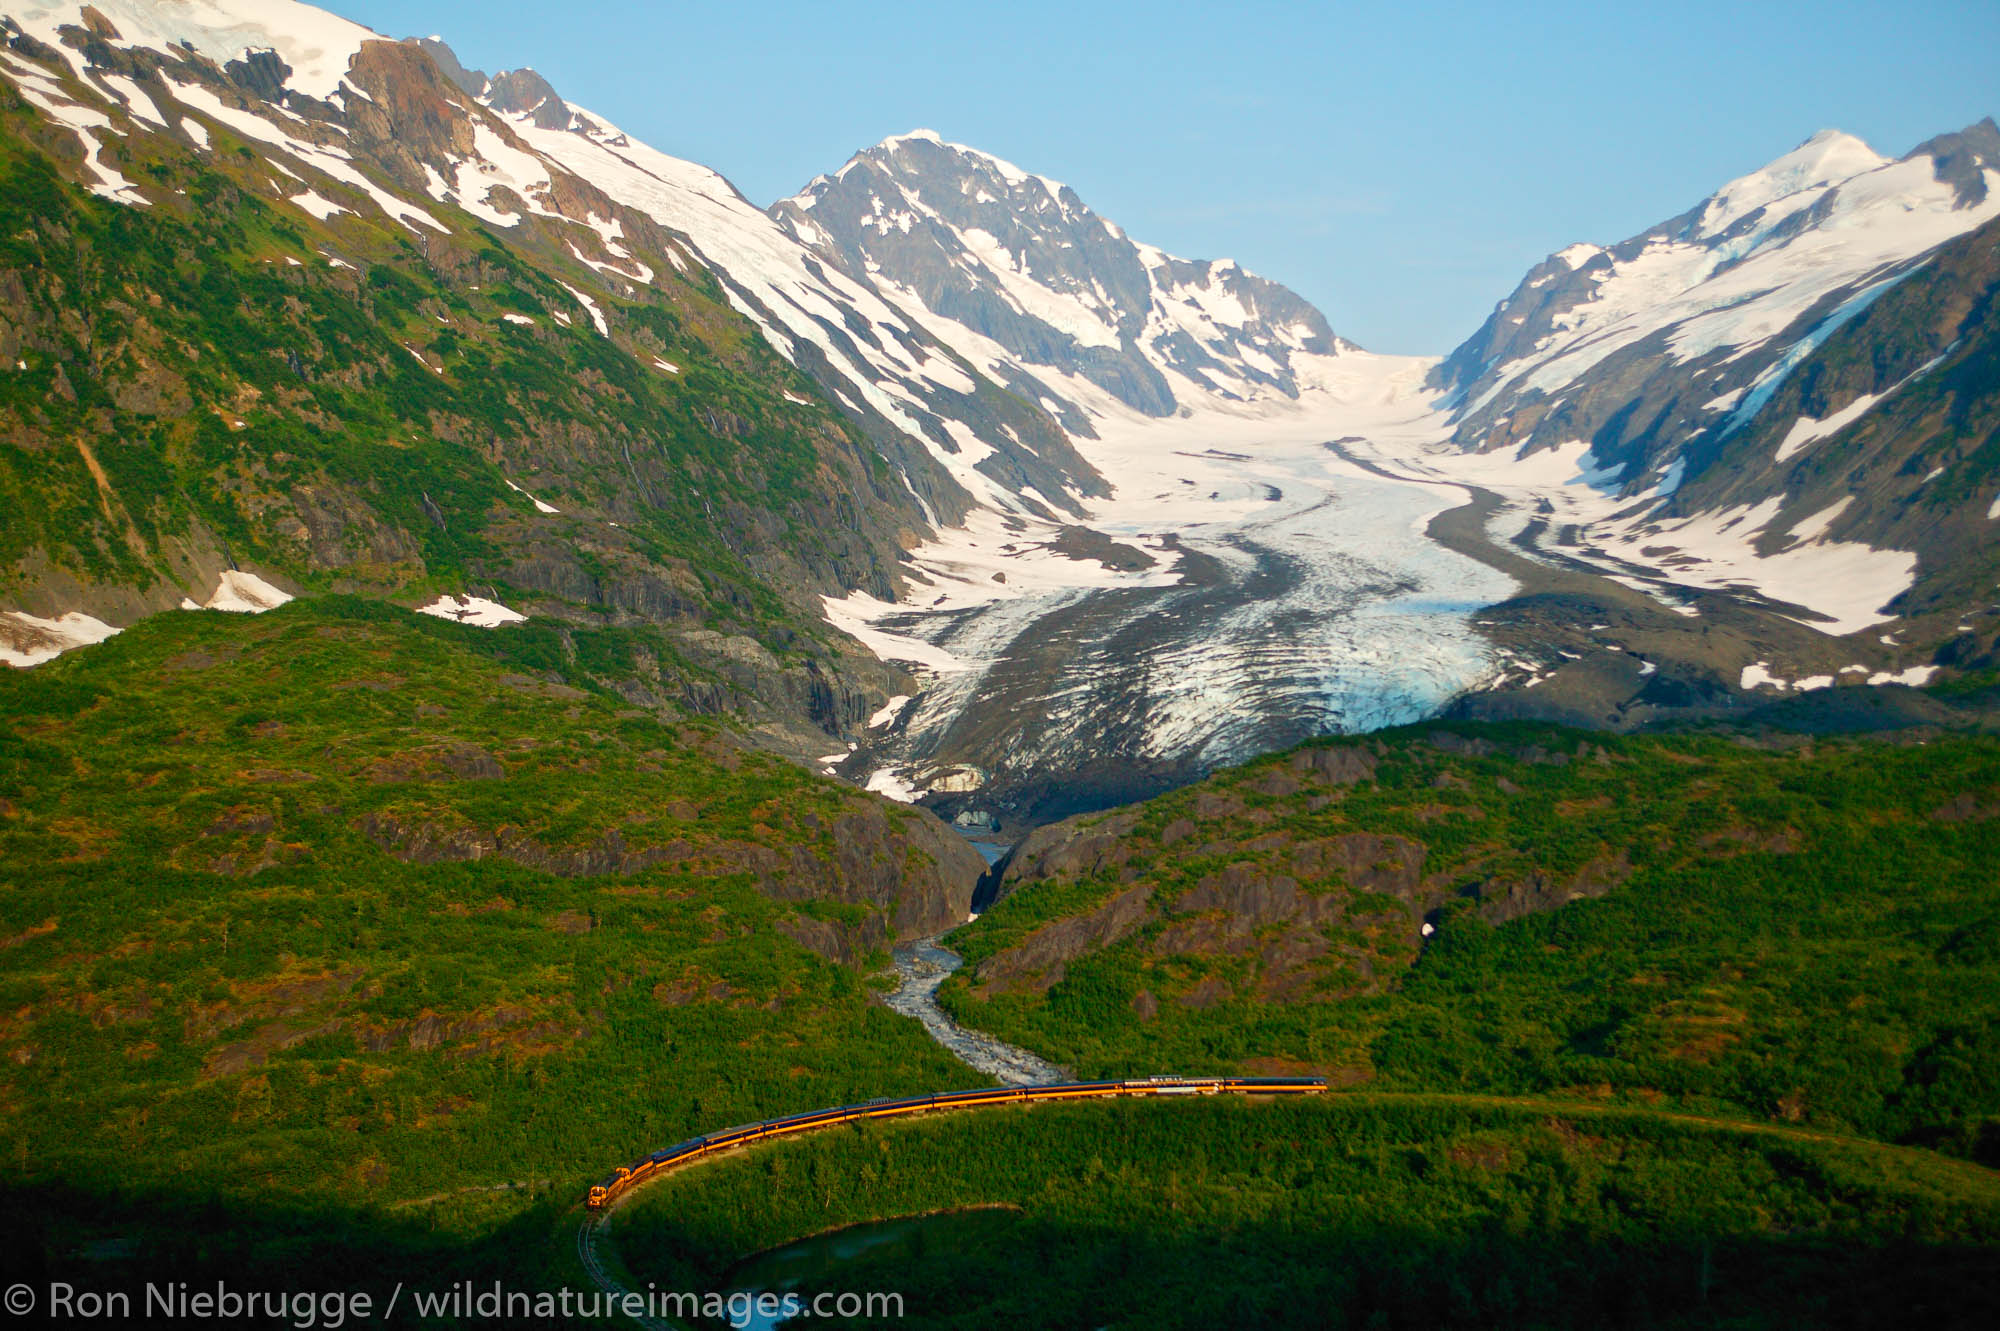 Alaska Railroad passes by Bartlett Glacier, Chugach National Forest, Kenai Peninsula on its way between Seward and Anchorage...